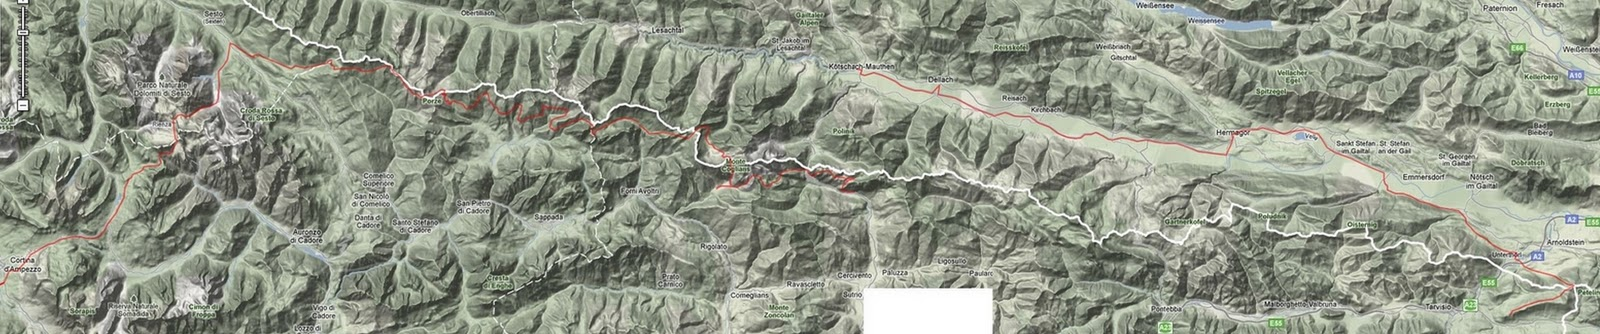 carte+4+alpes+2011.jpg